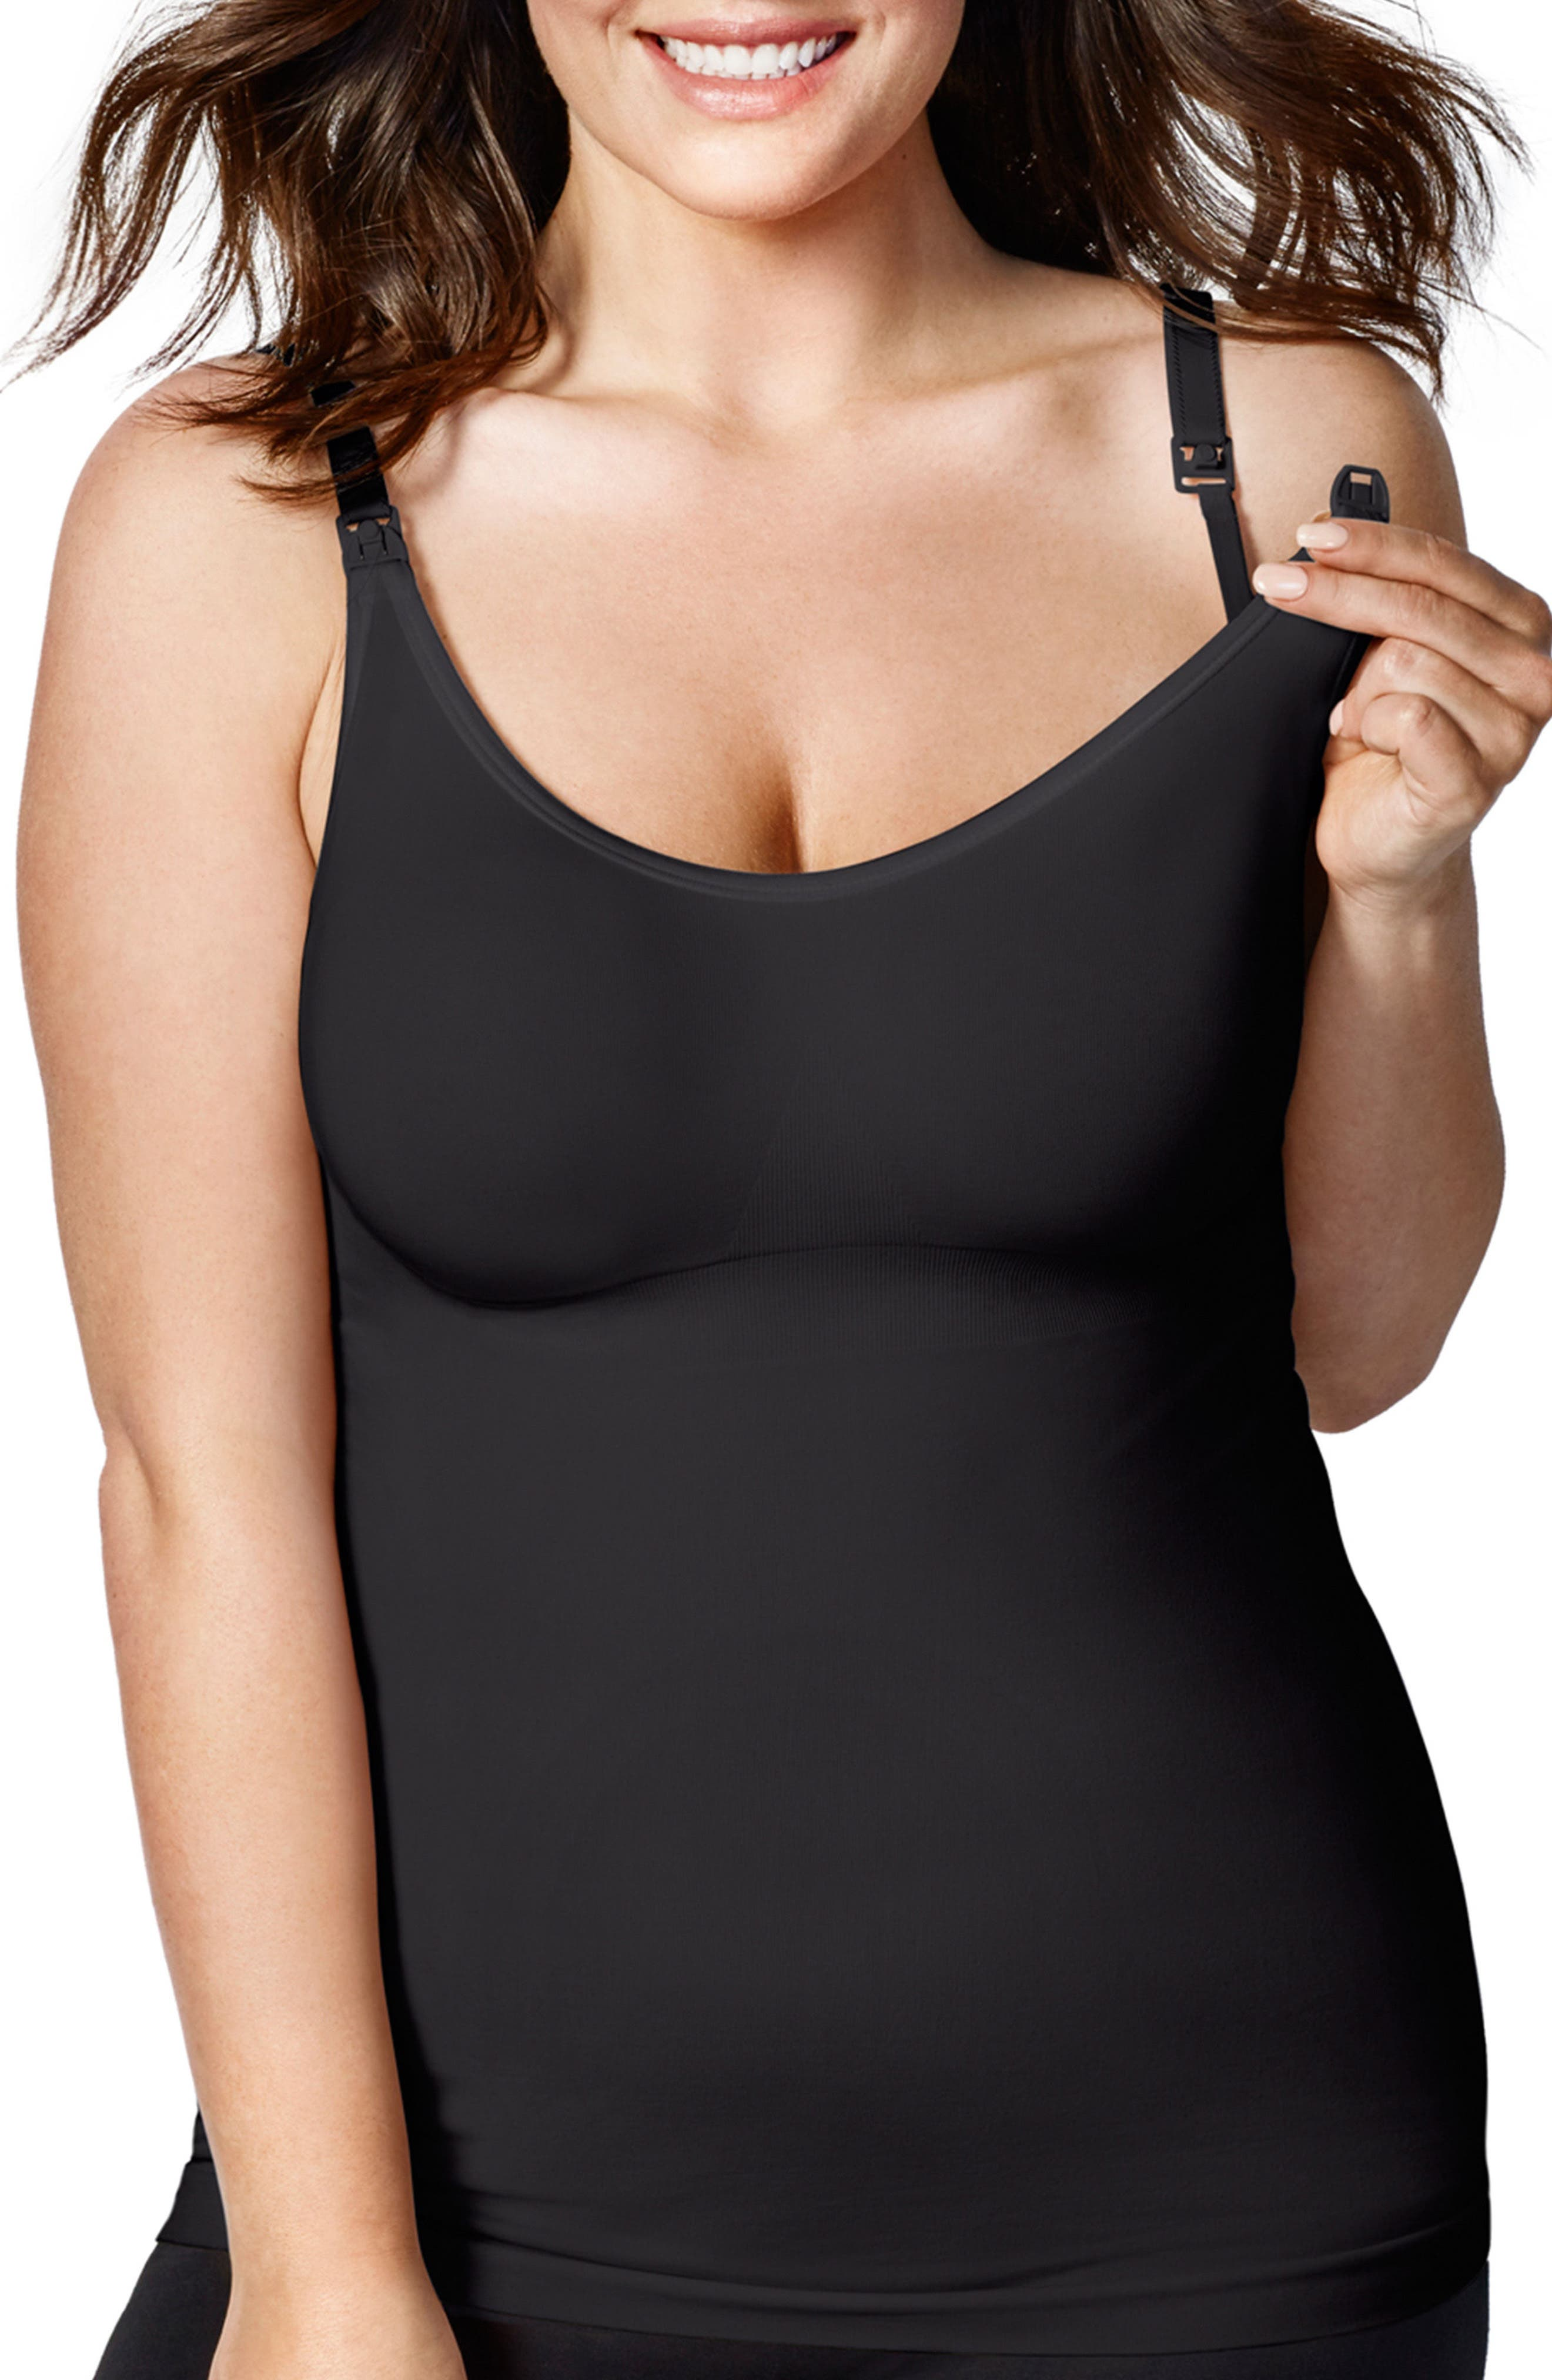 BRAVADO MATERNITY, Bravado Designs Body Silk Seaming Maternity/Nursing Camisole, Main thumbnail 1, color, BLACK